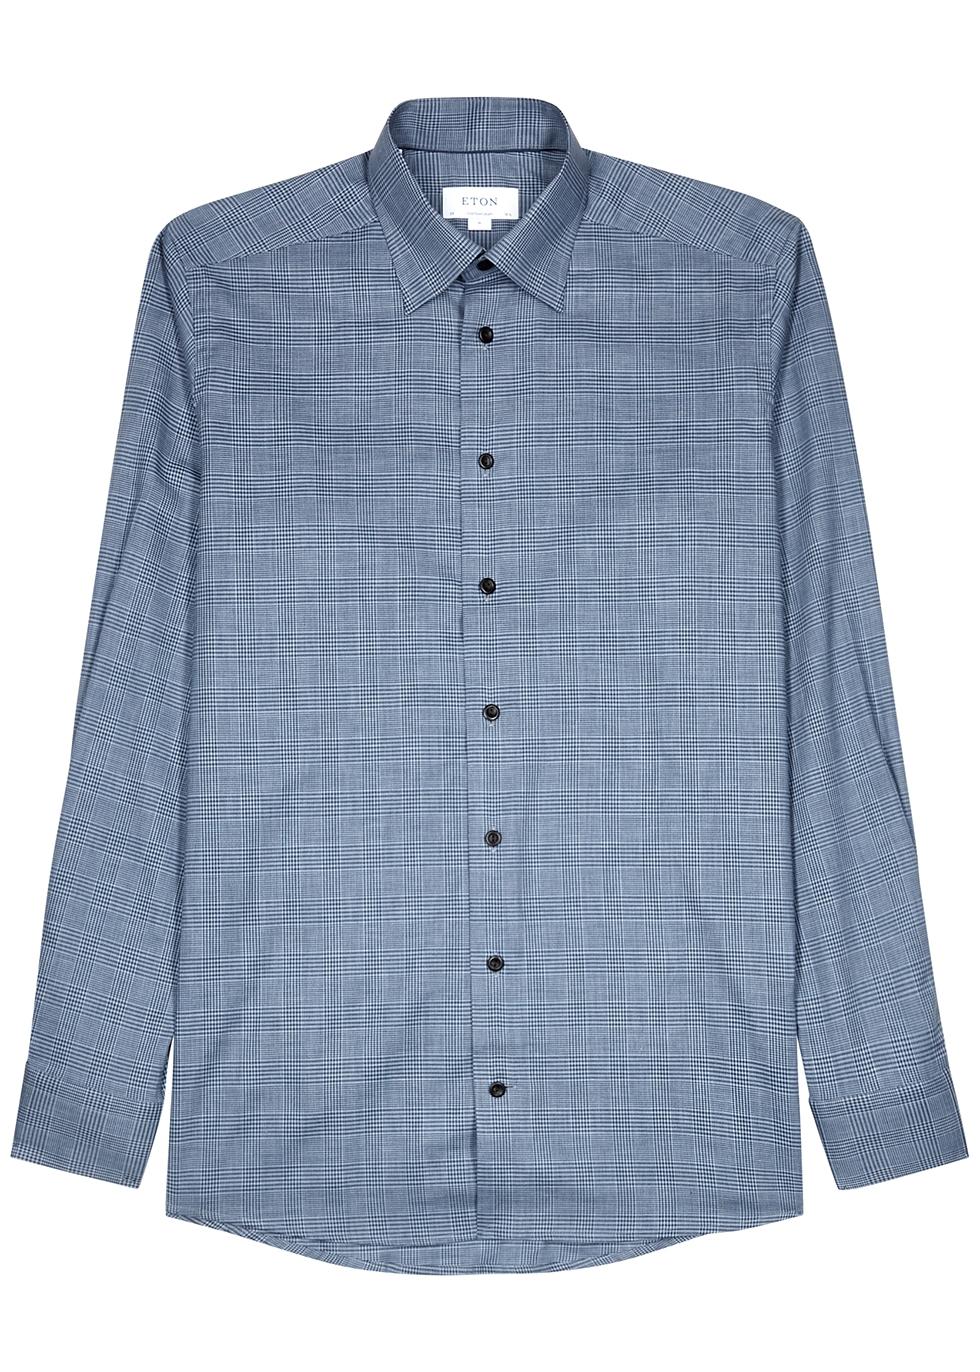 Blue contemporary checked cotton shirt